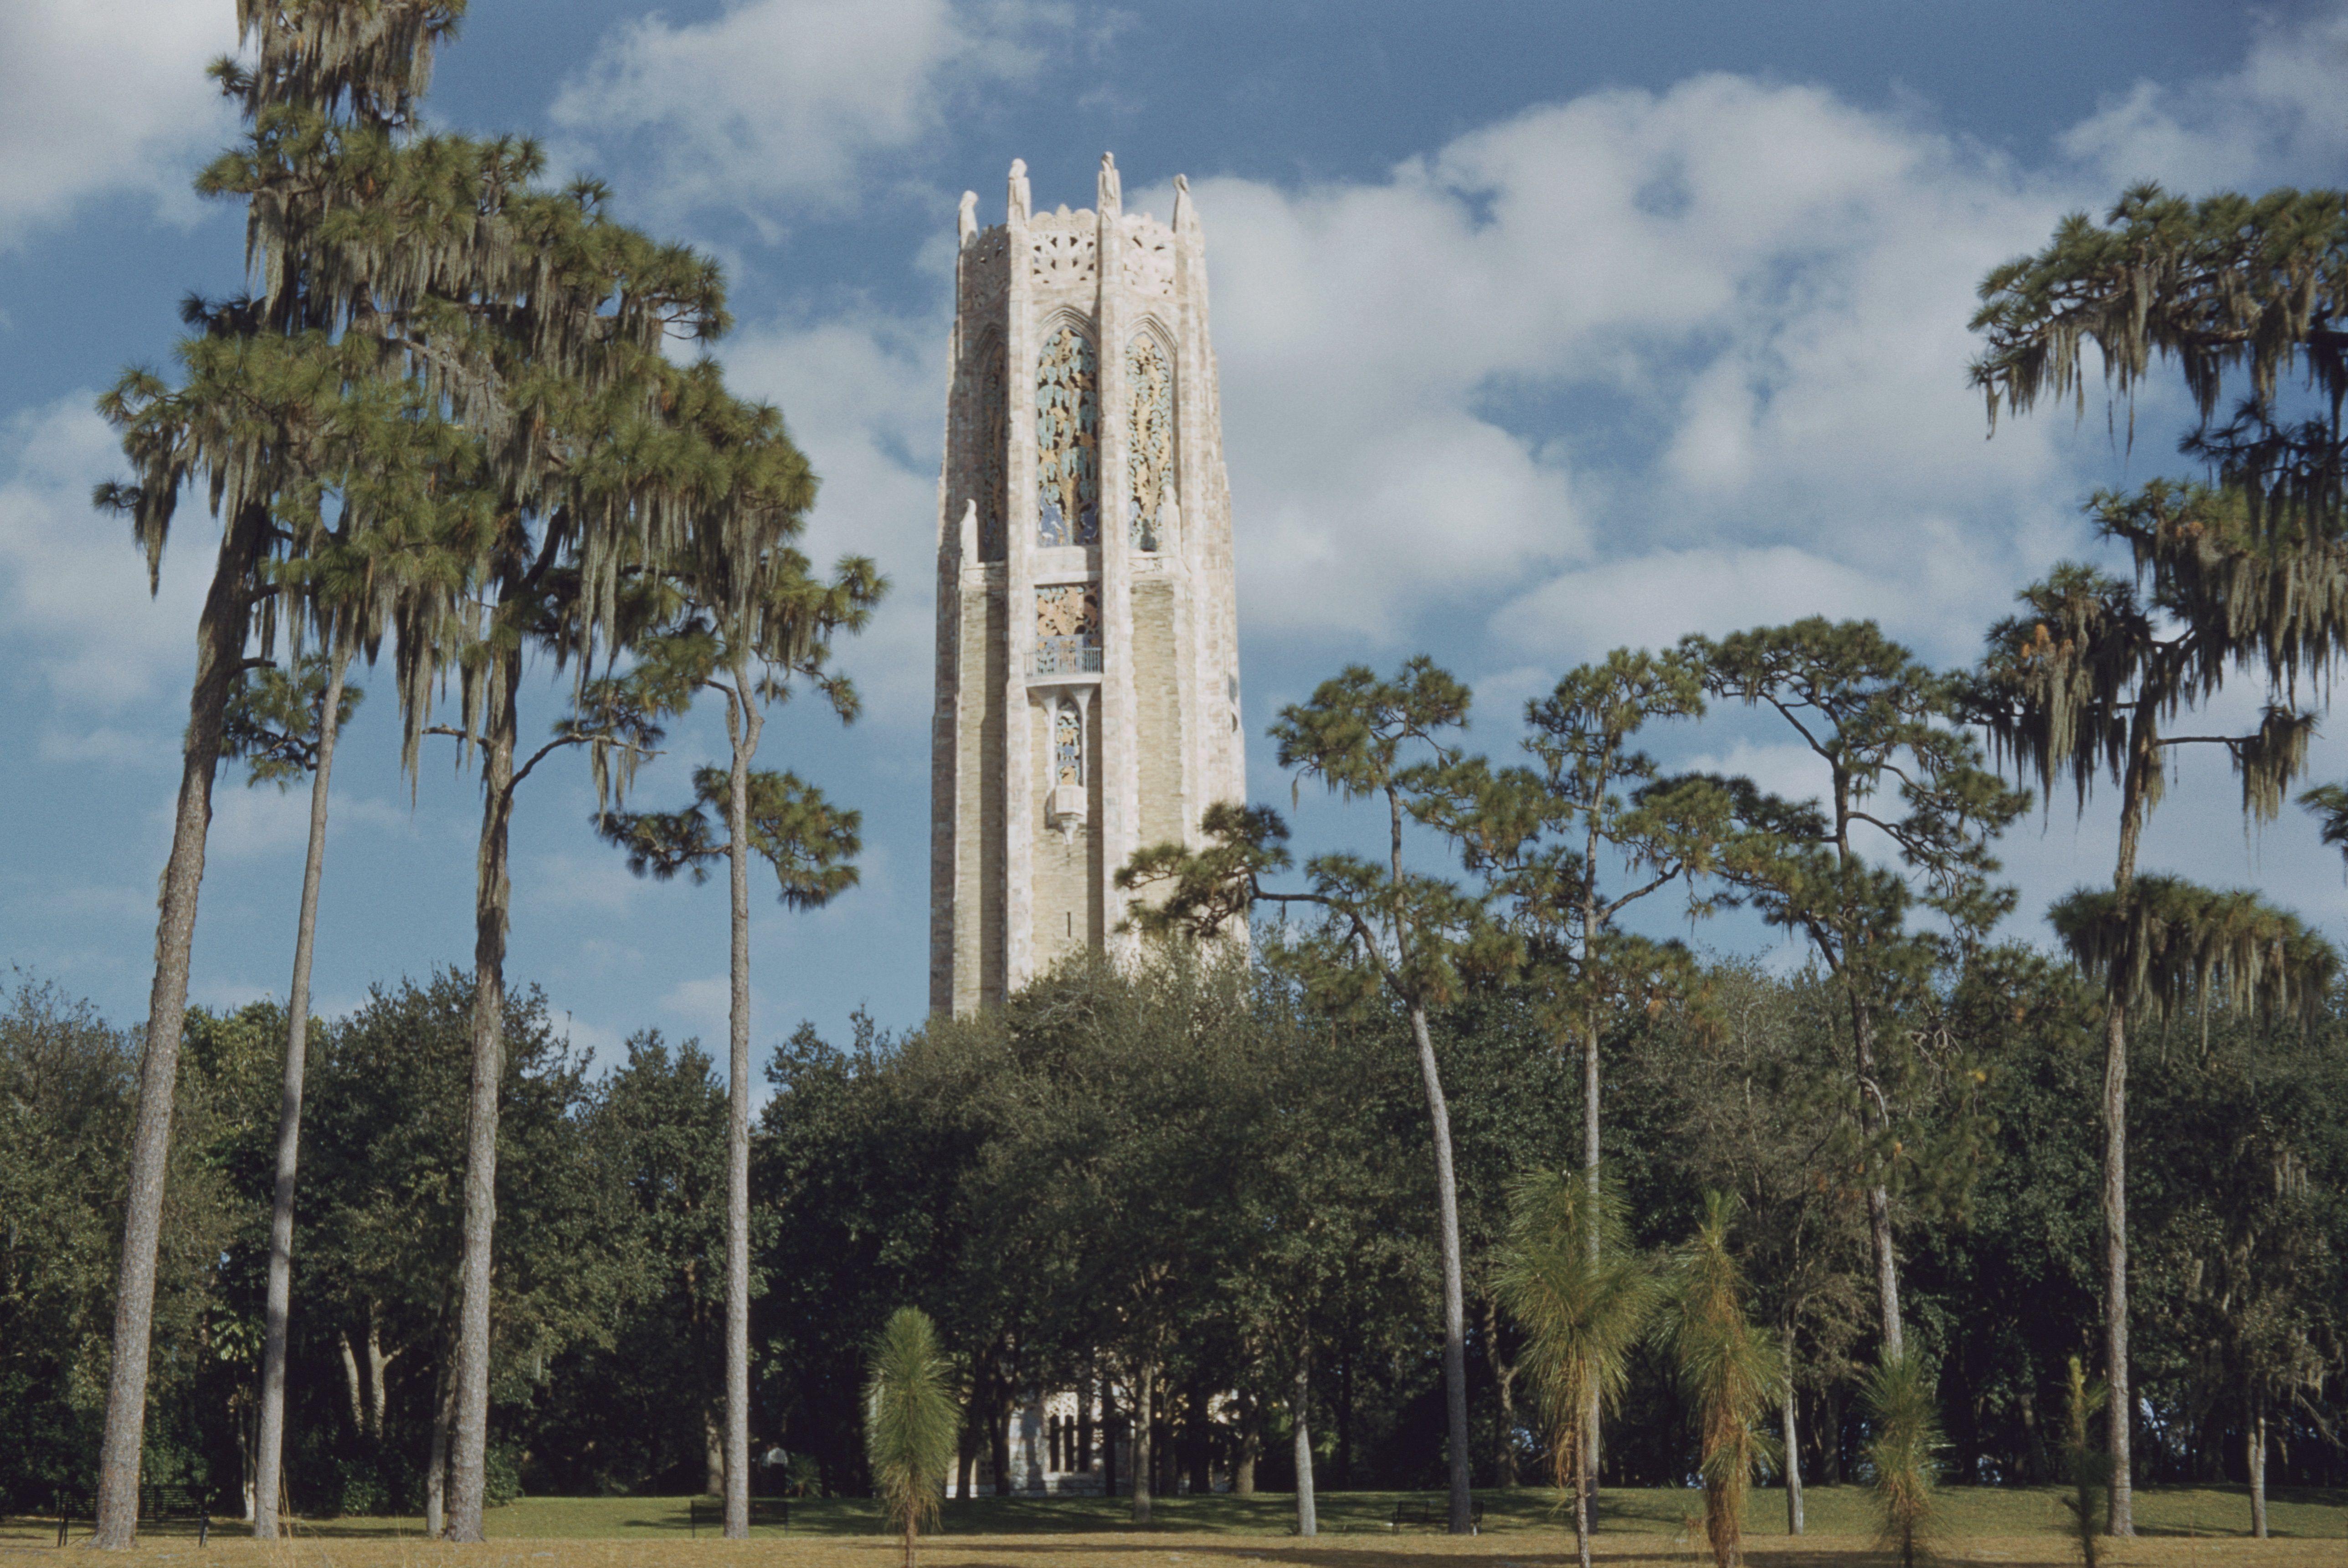 Bok Tower in Bok Tower Gardens, Florida,